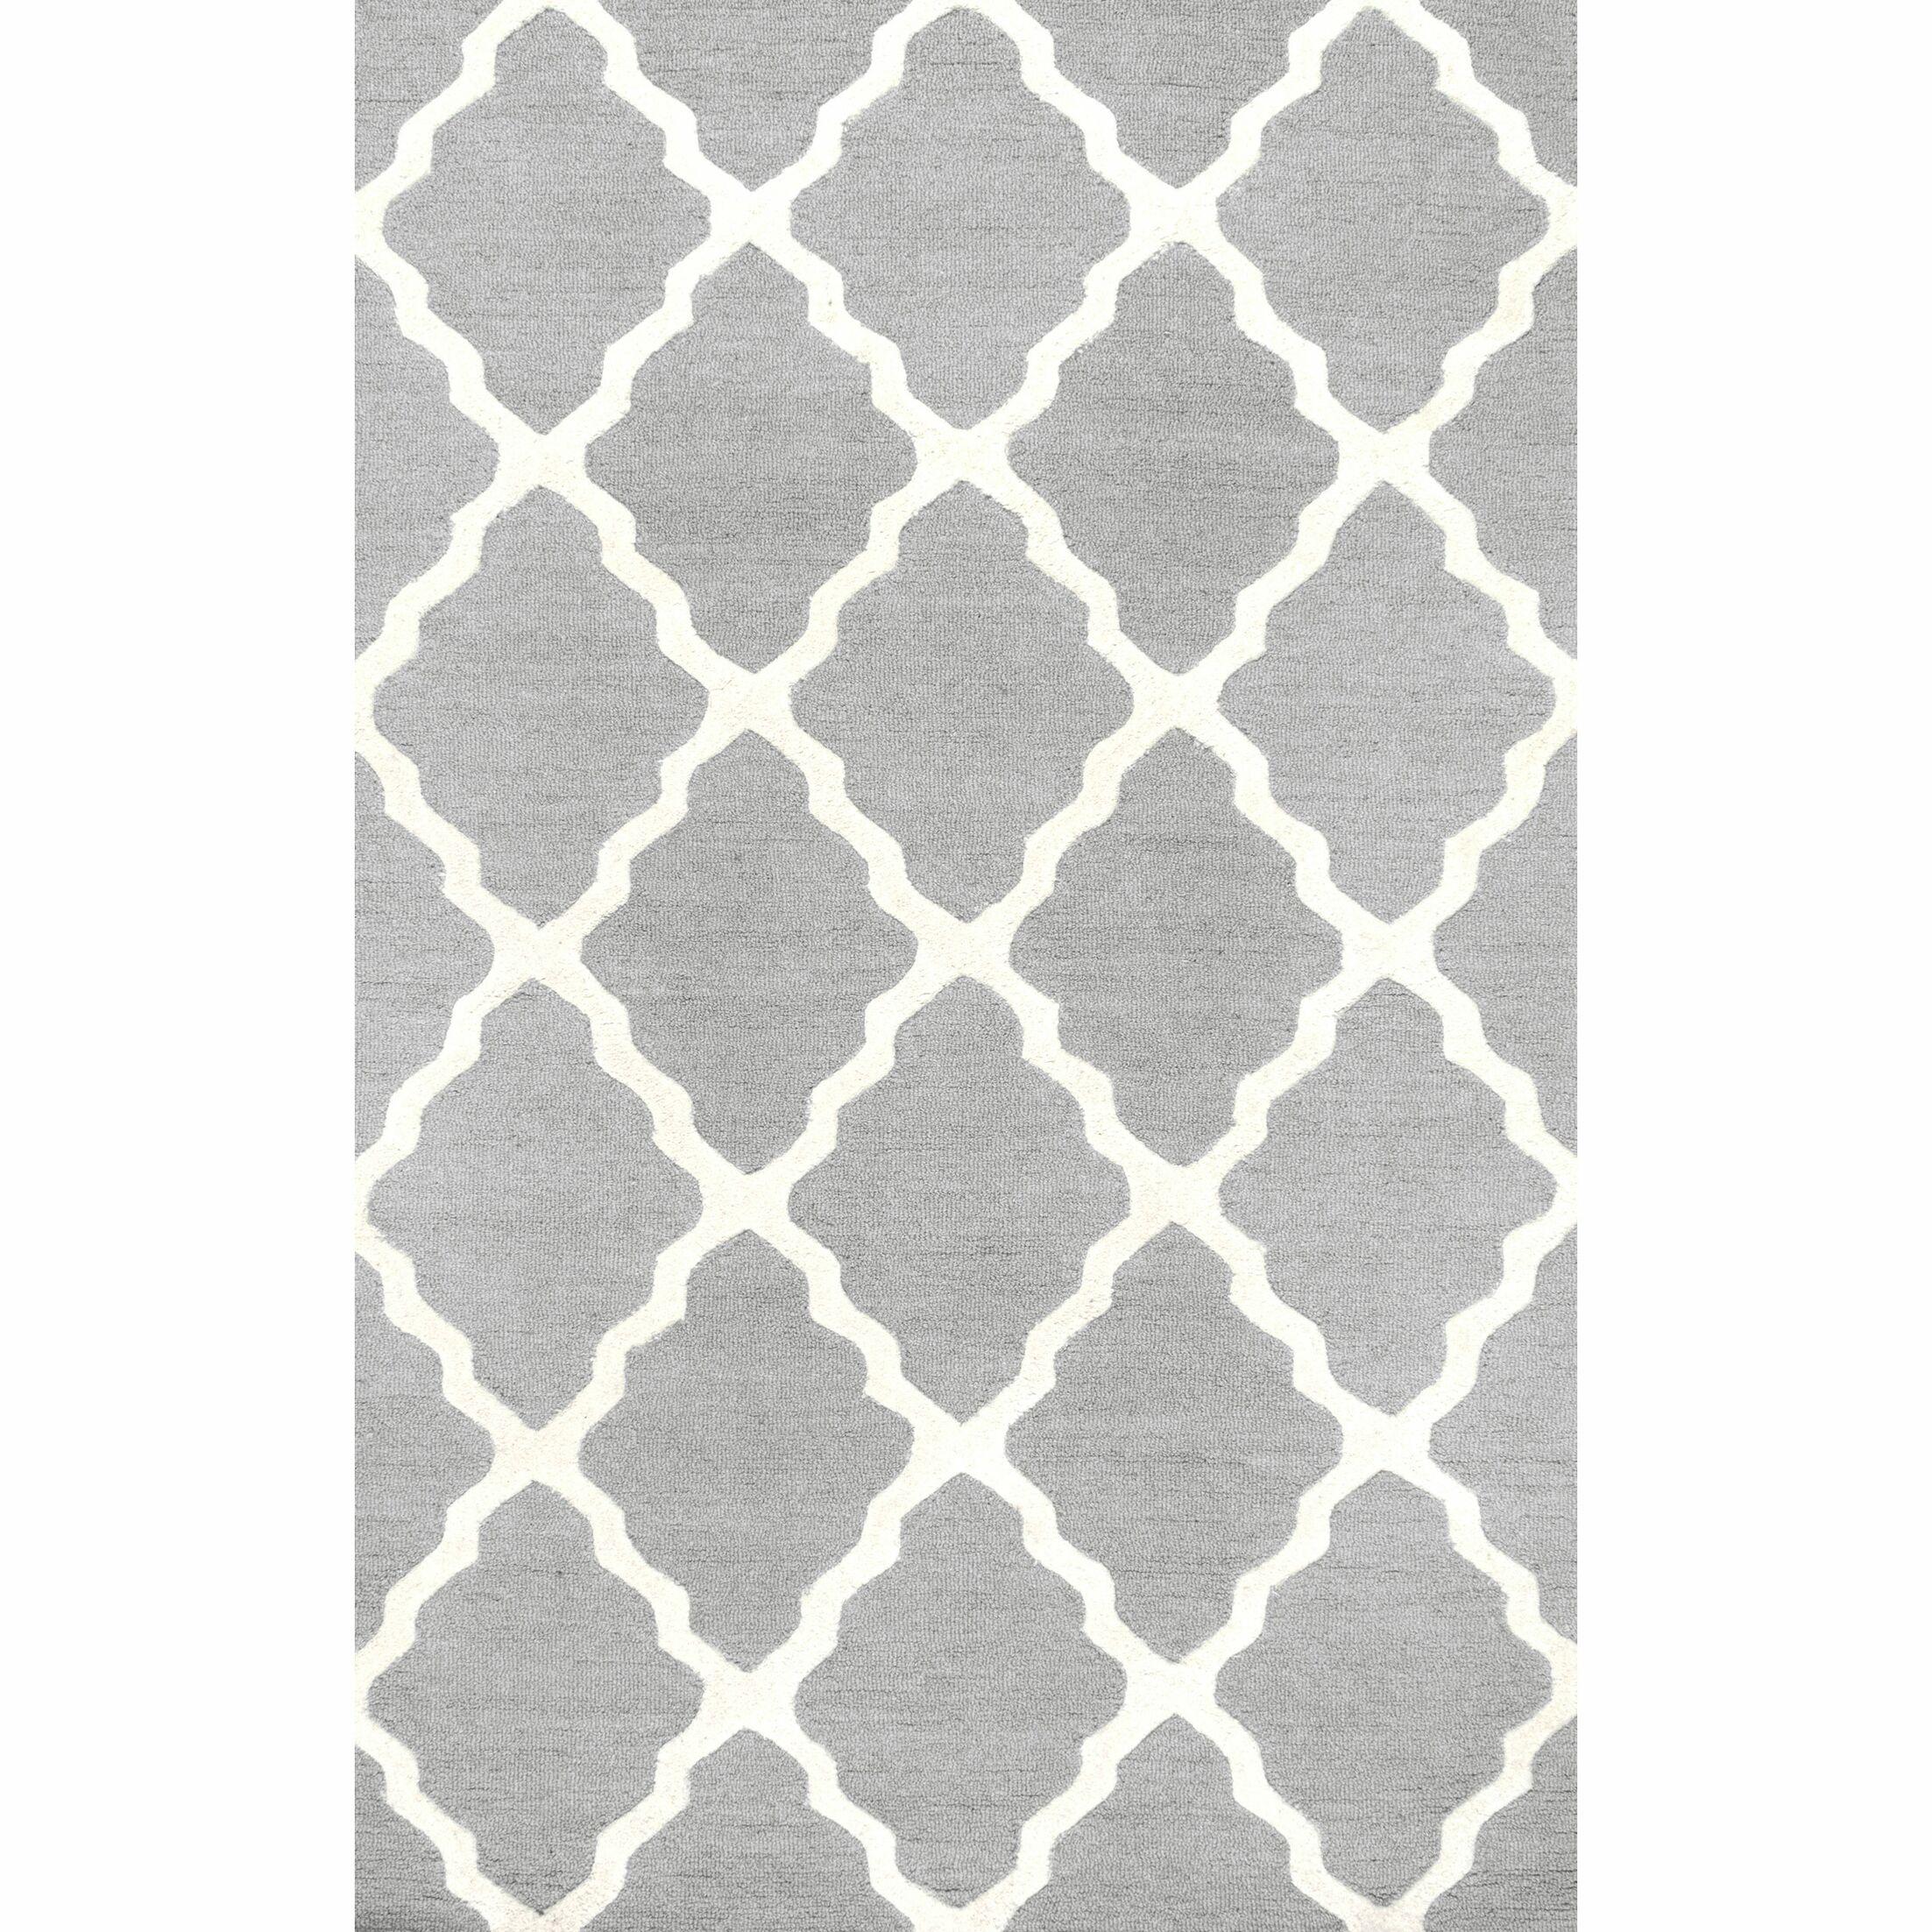 Tadlock Hand-Woven Gray Area Rug Rug Size: Rectangle 5' x 8'